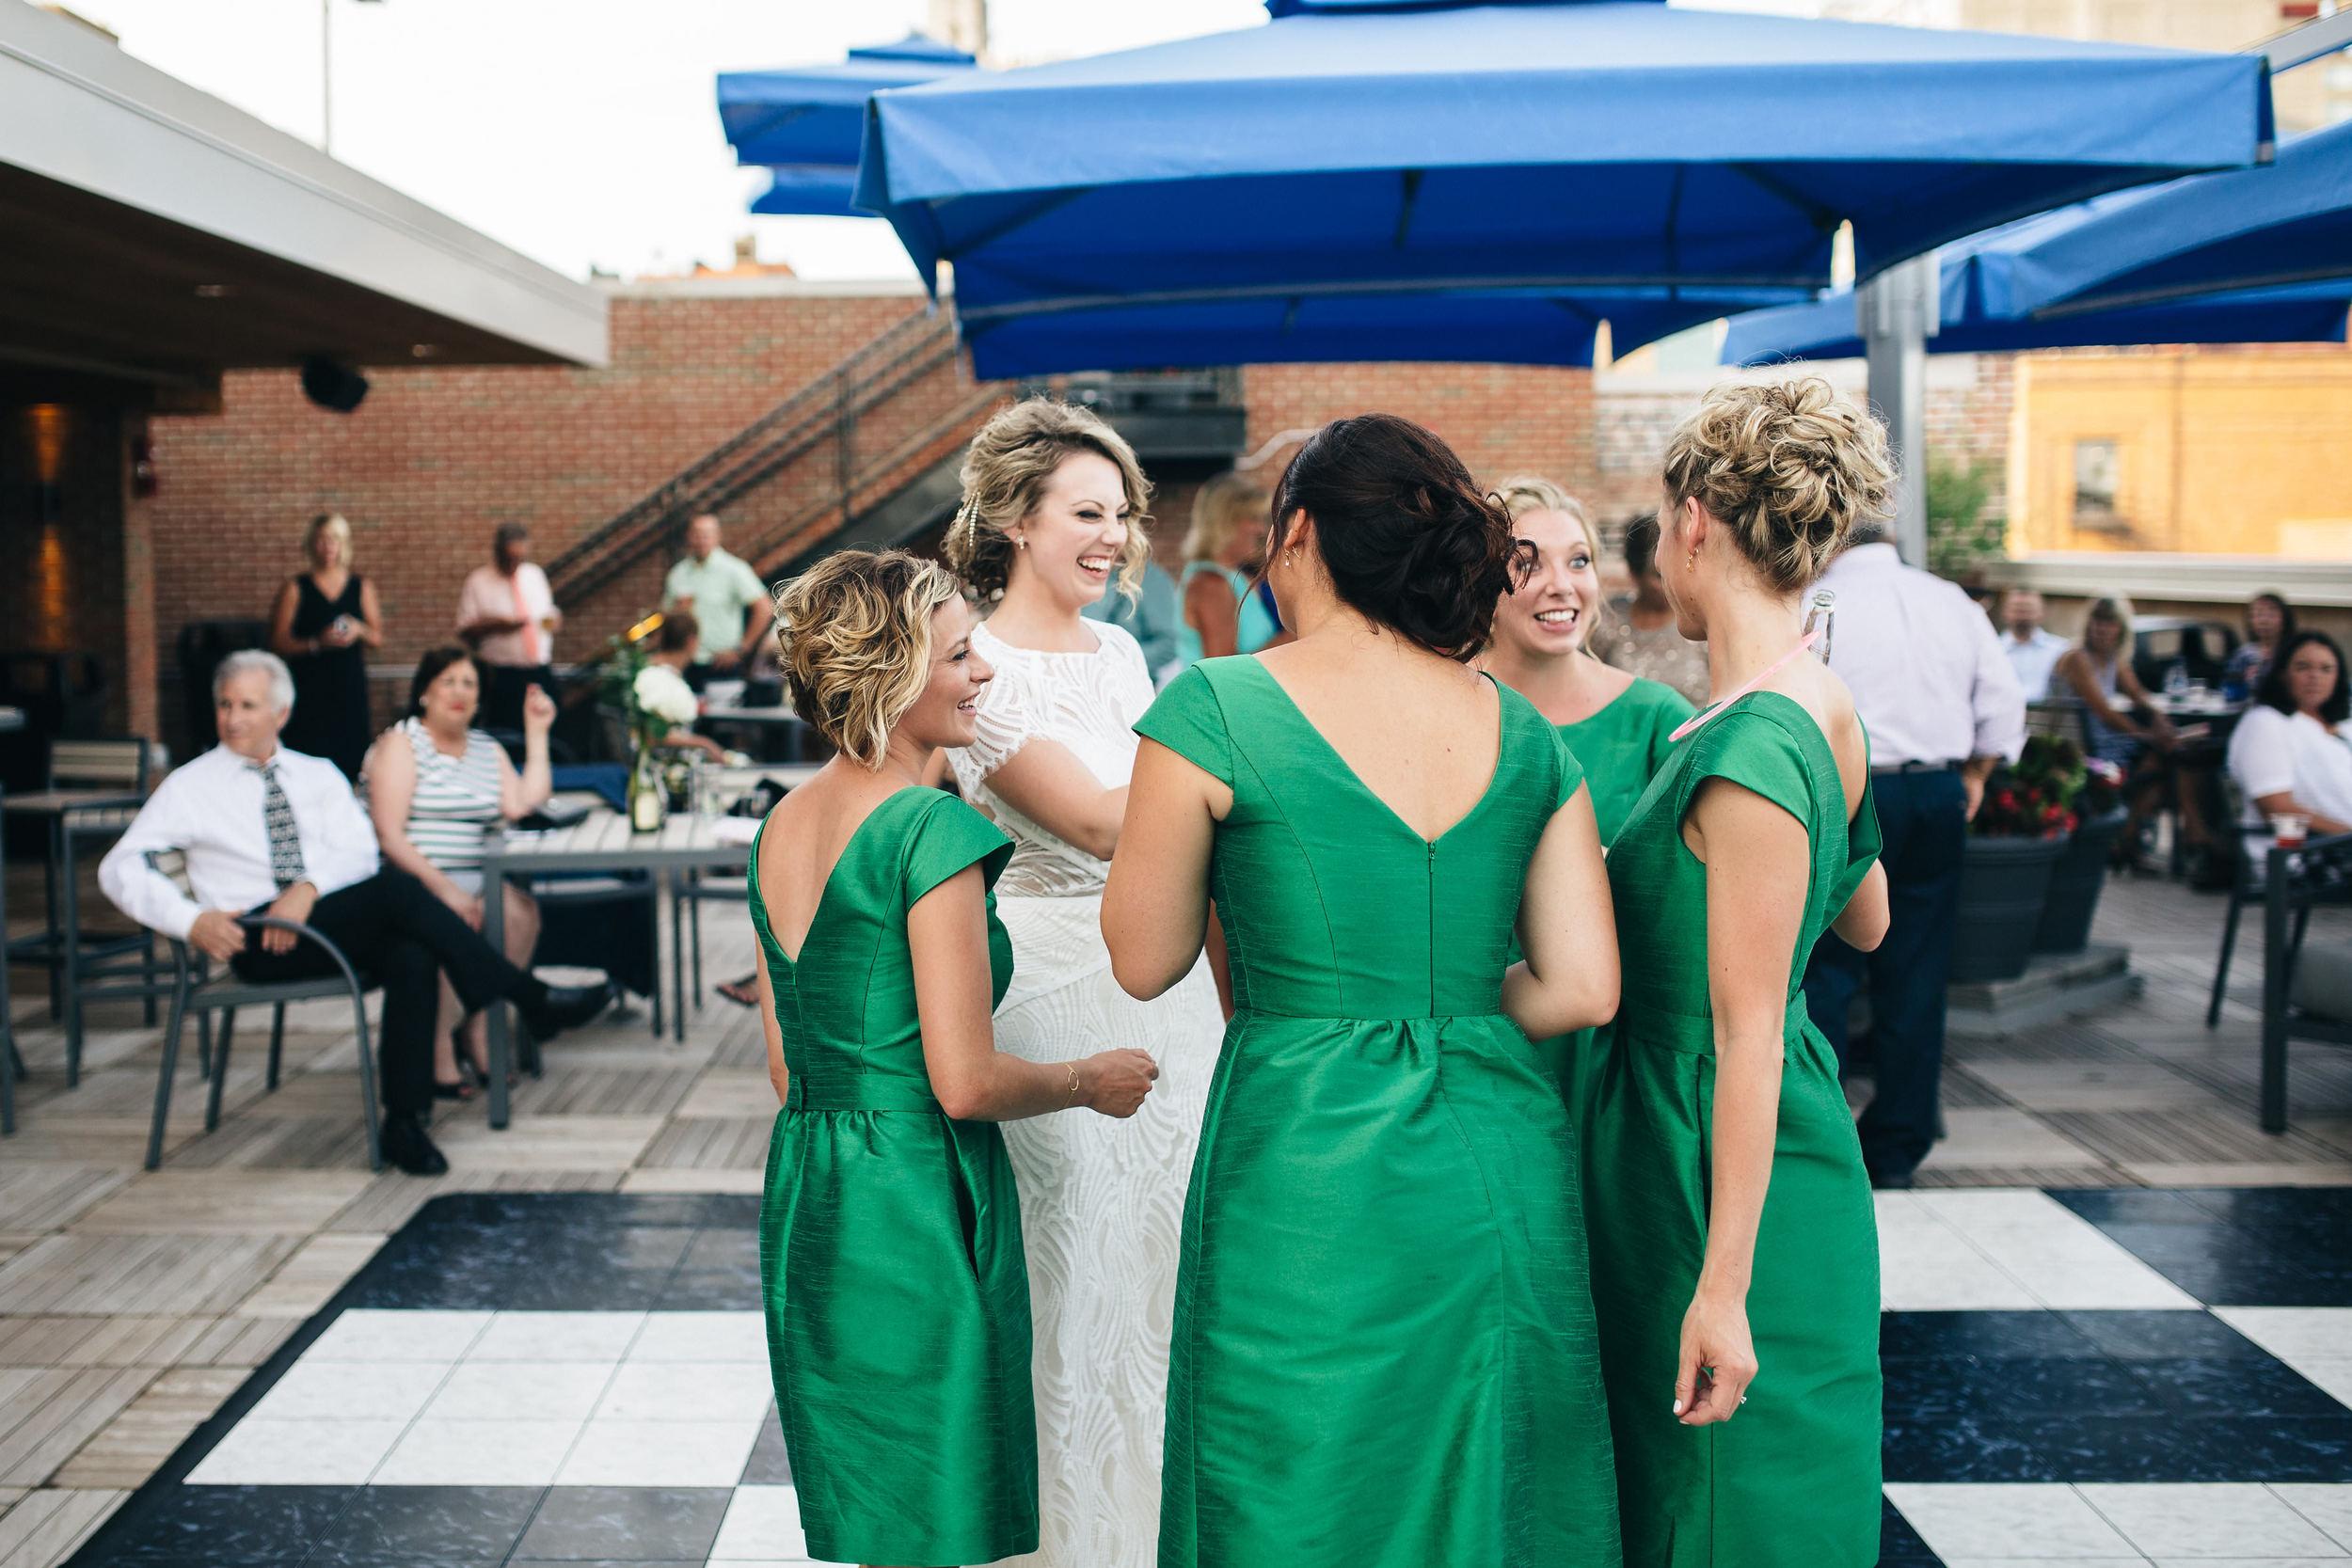 Bridesmaids dancing at wedding reception at Hensville in Toledo.